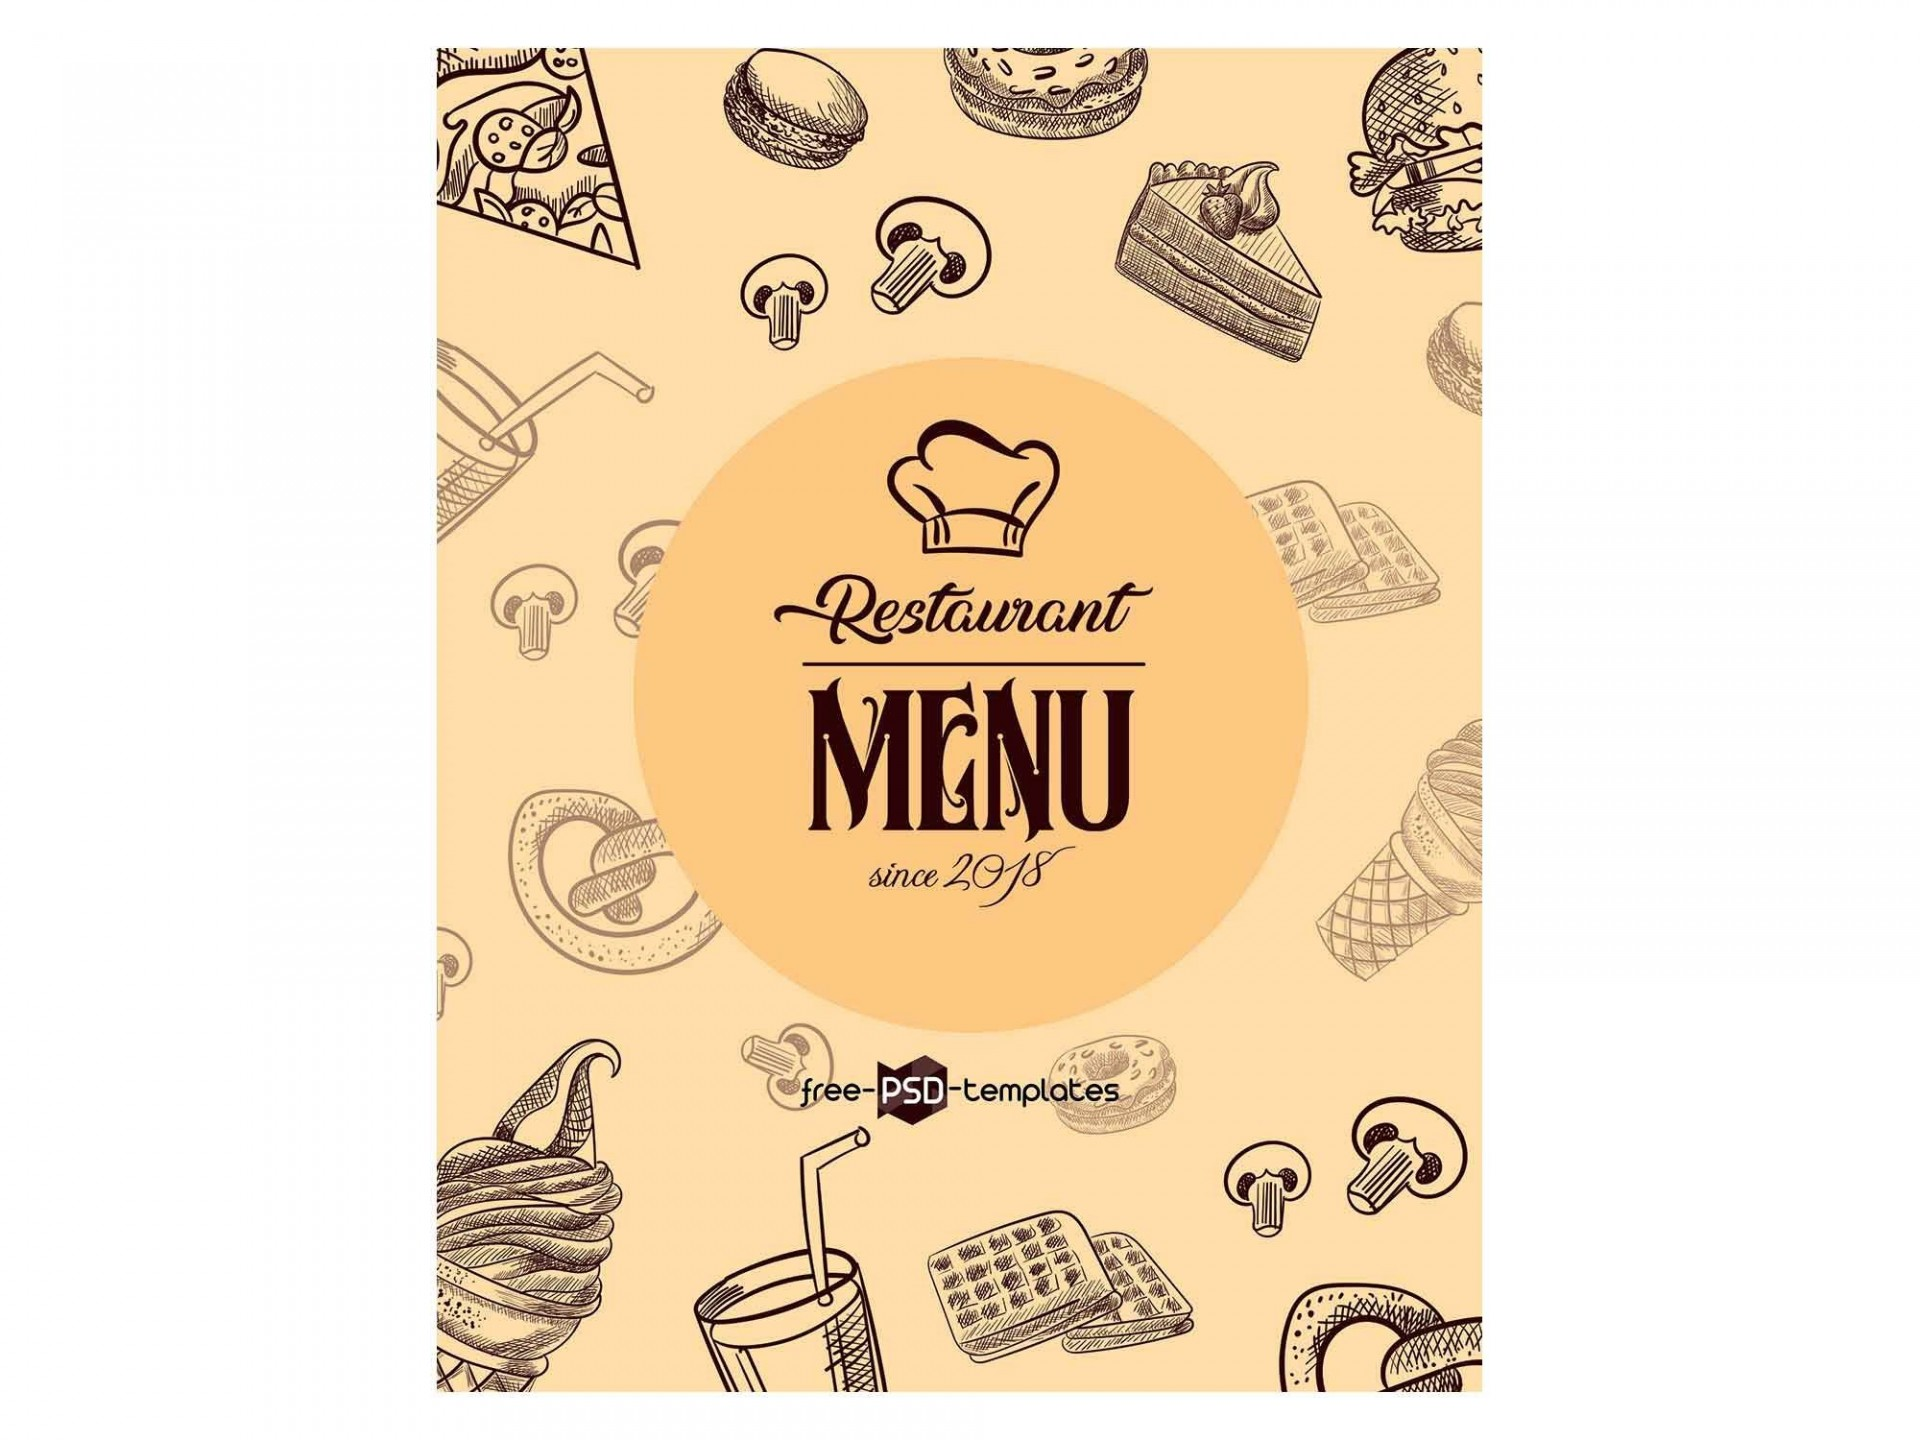 008 Surprising Food Menu Card Template Free Download Idea 1920